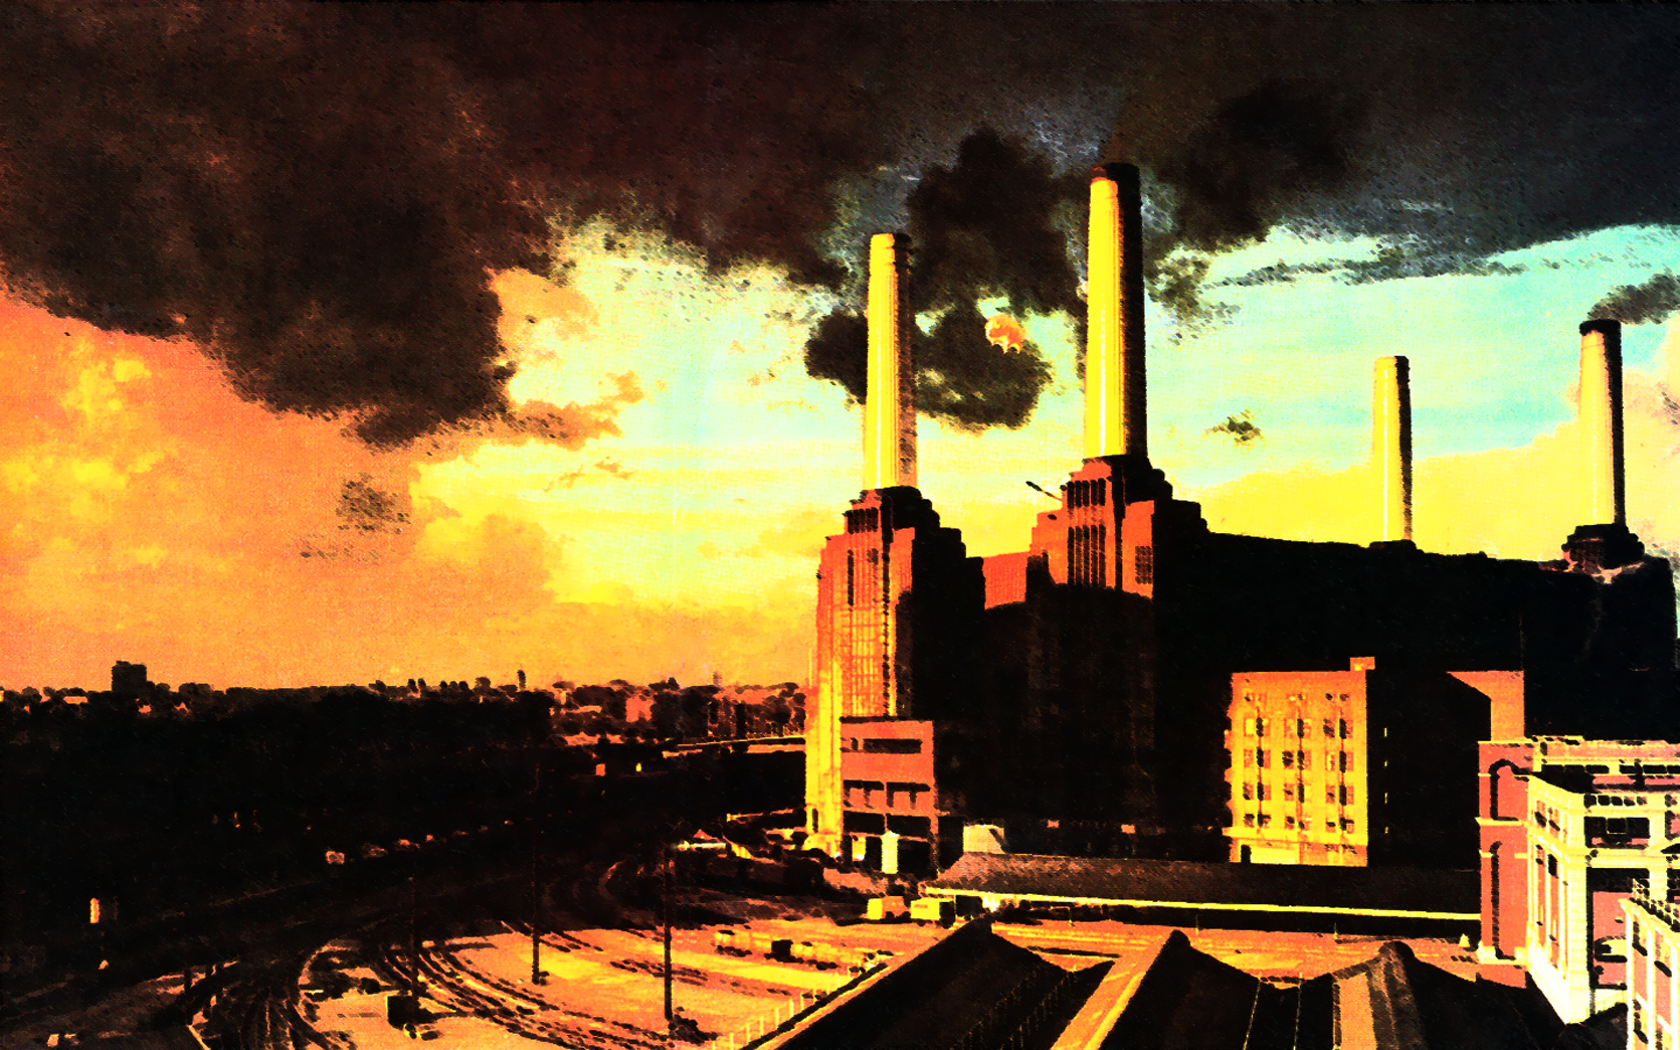 Pink Floyd Wallpaper 1680x1050 Pink Floyd Battersea 1680x1050